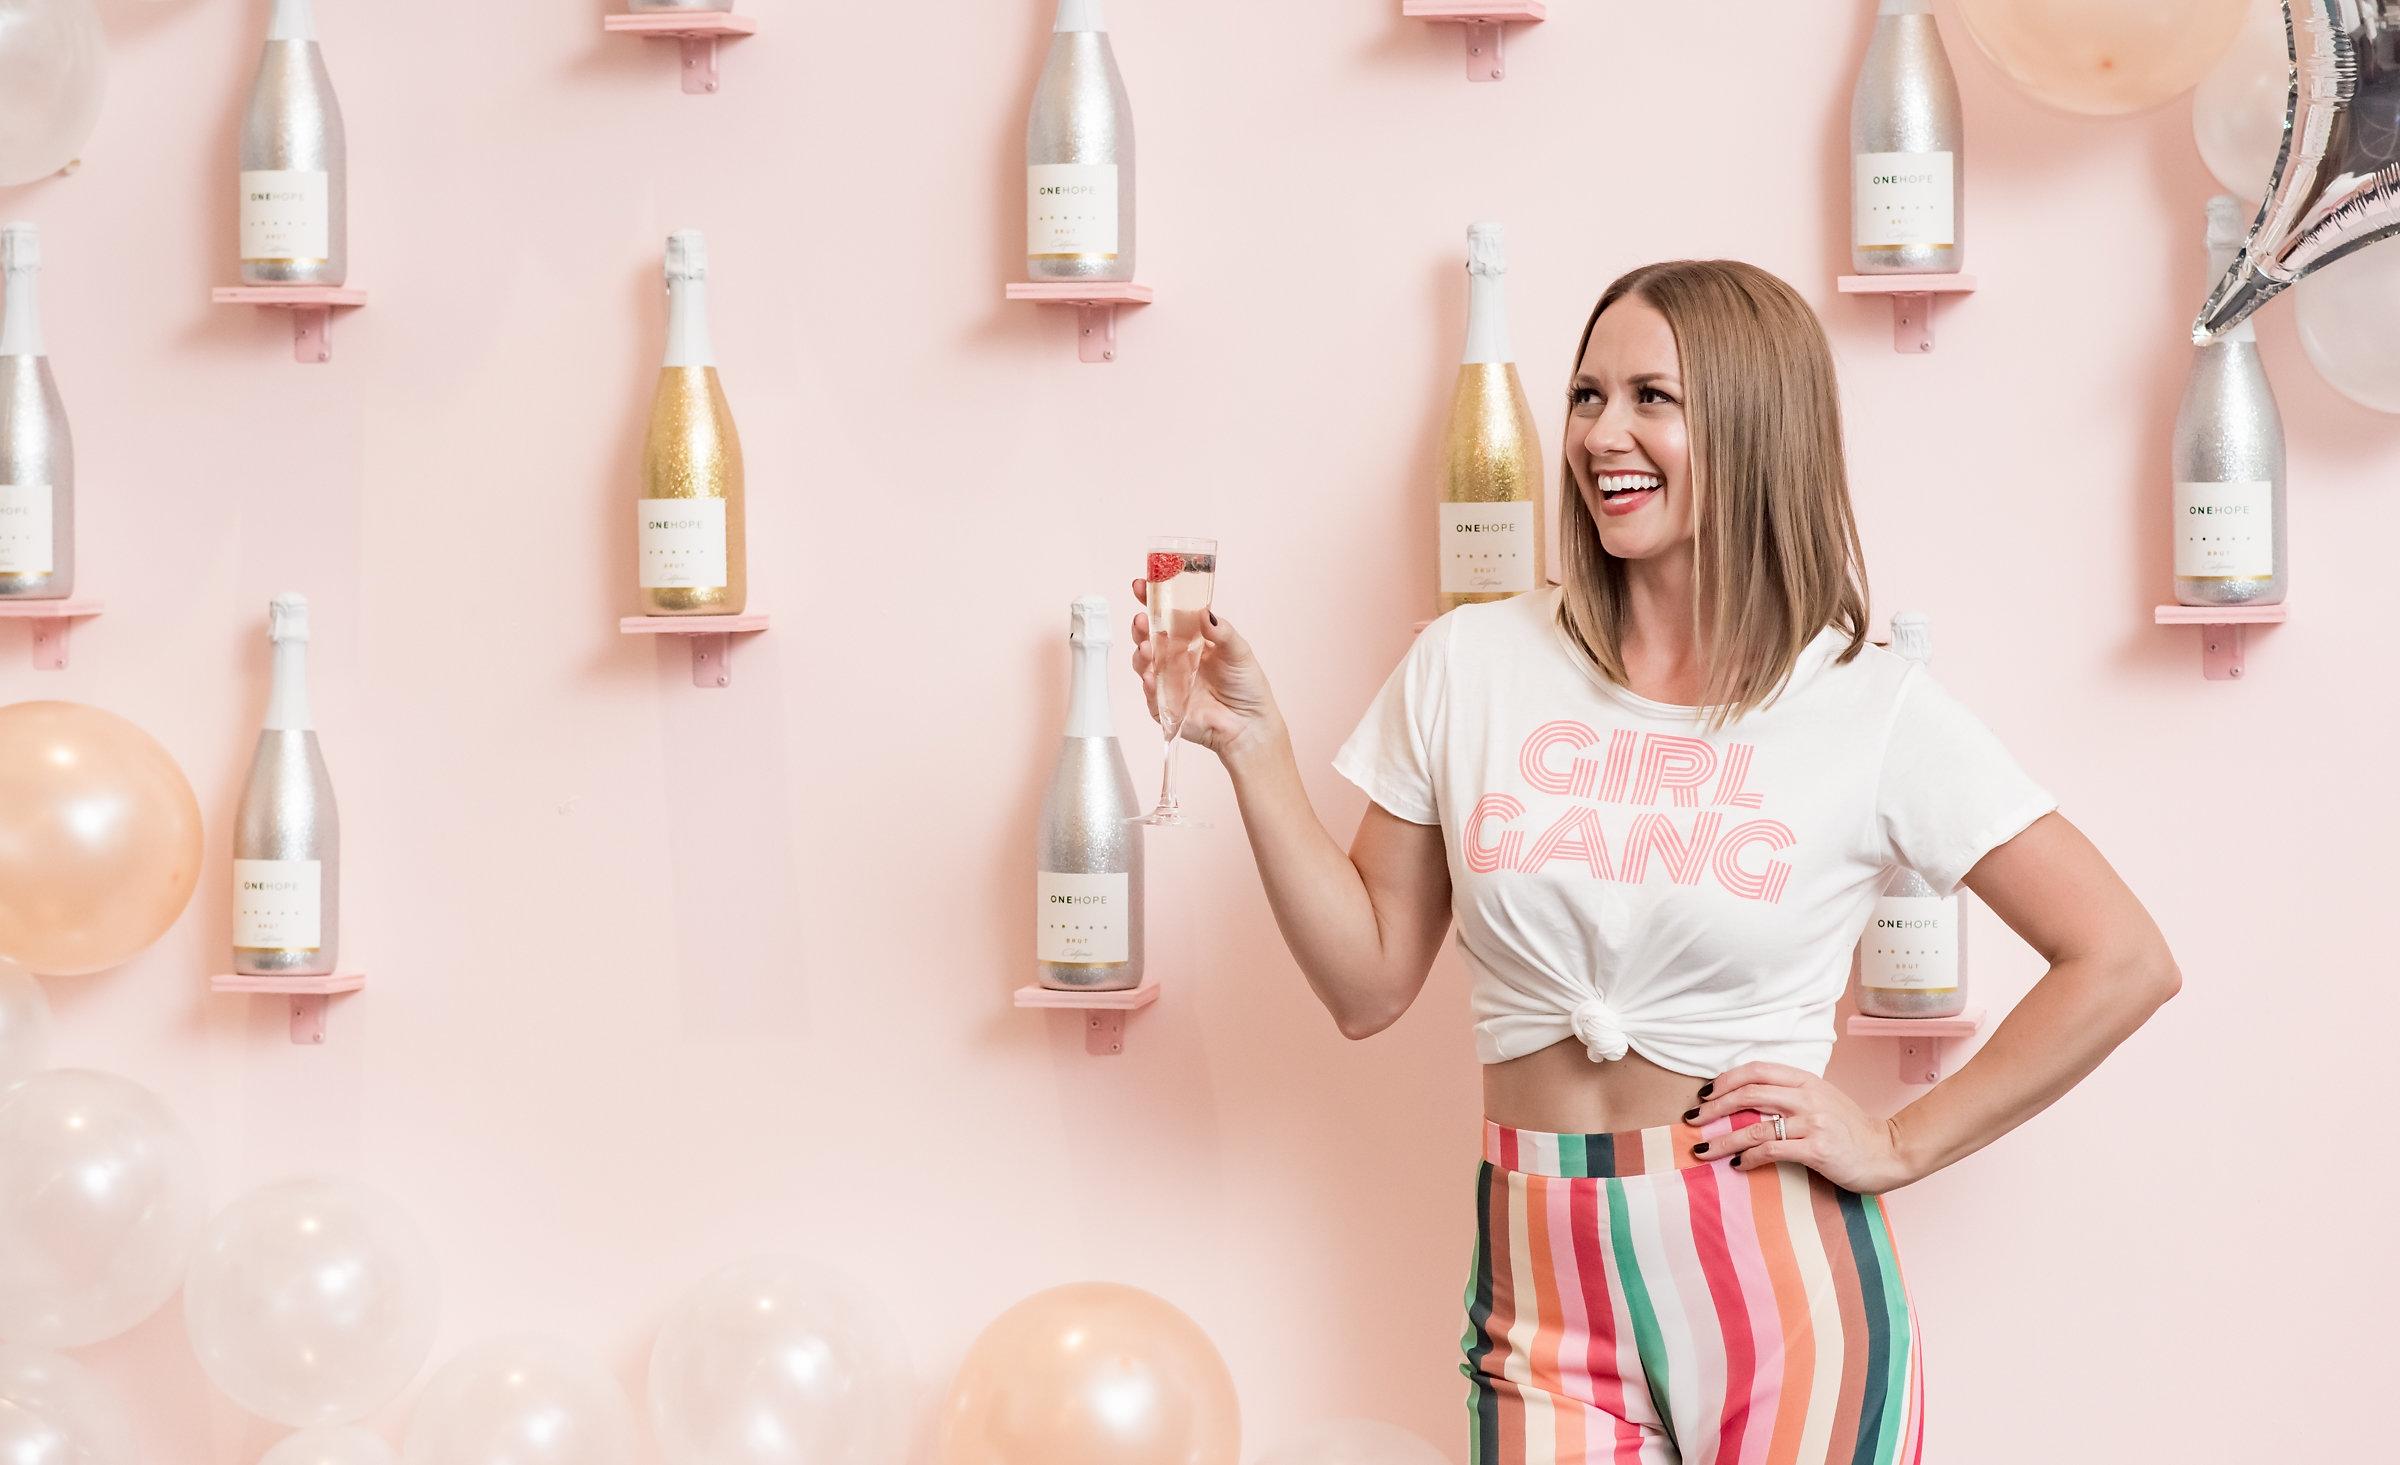 Meet lindsey schwartz - Wellness entrepreneur, author, and Midwest girl at heart